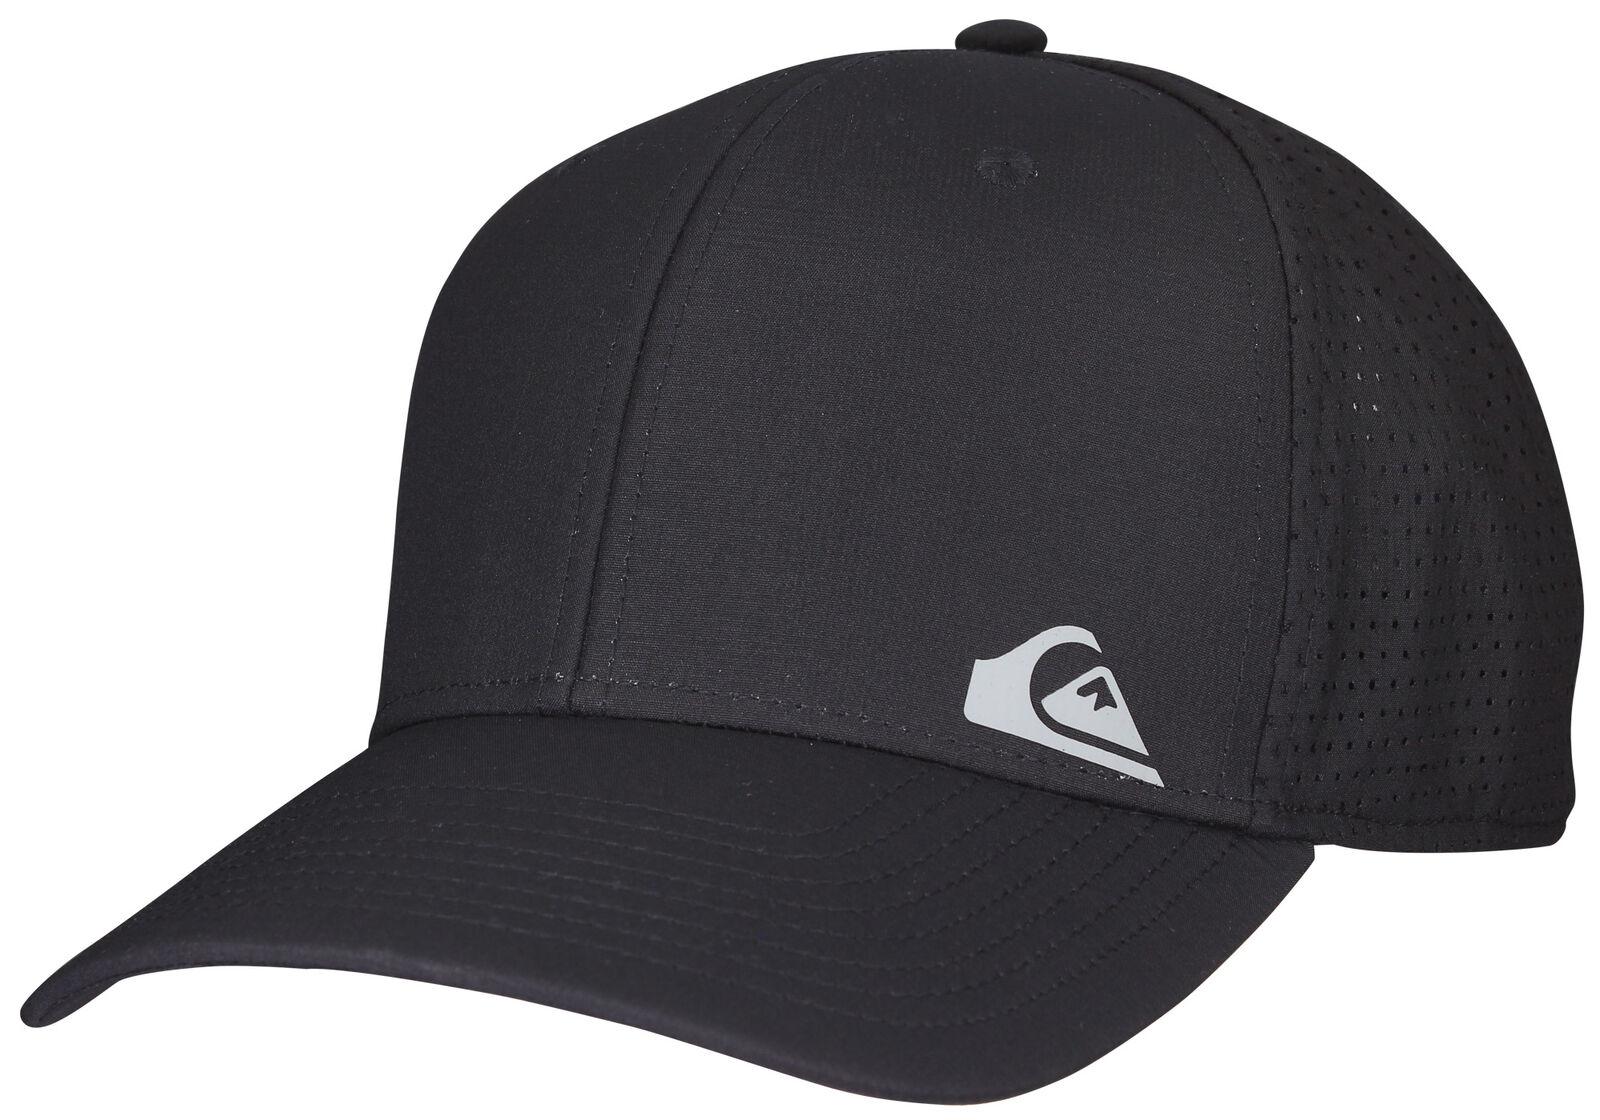 Quiksilver Technabutter Technabutter Technabutter Performance Hat Black 0d3cde